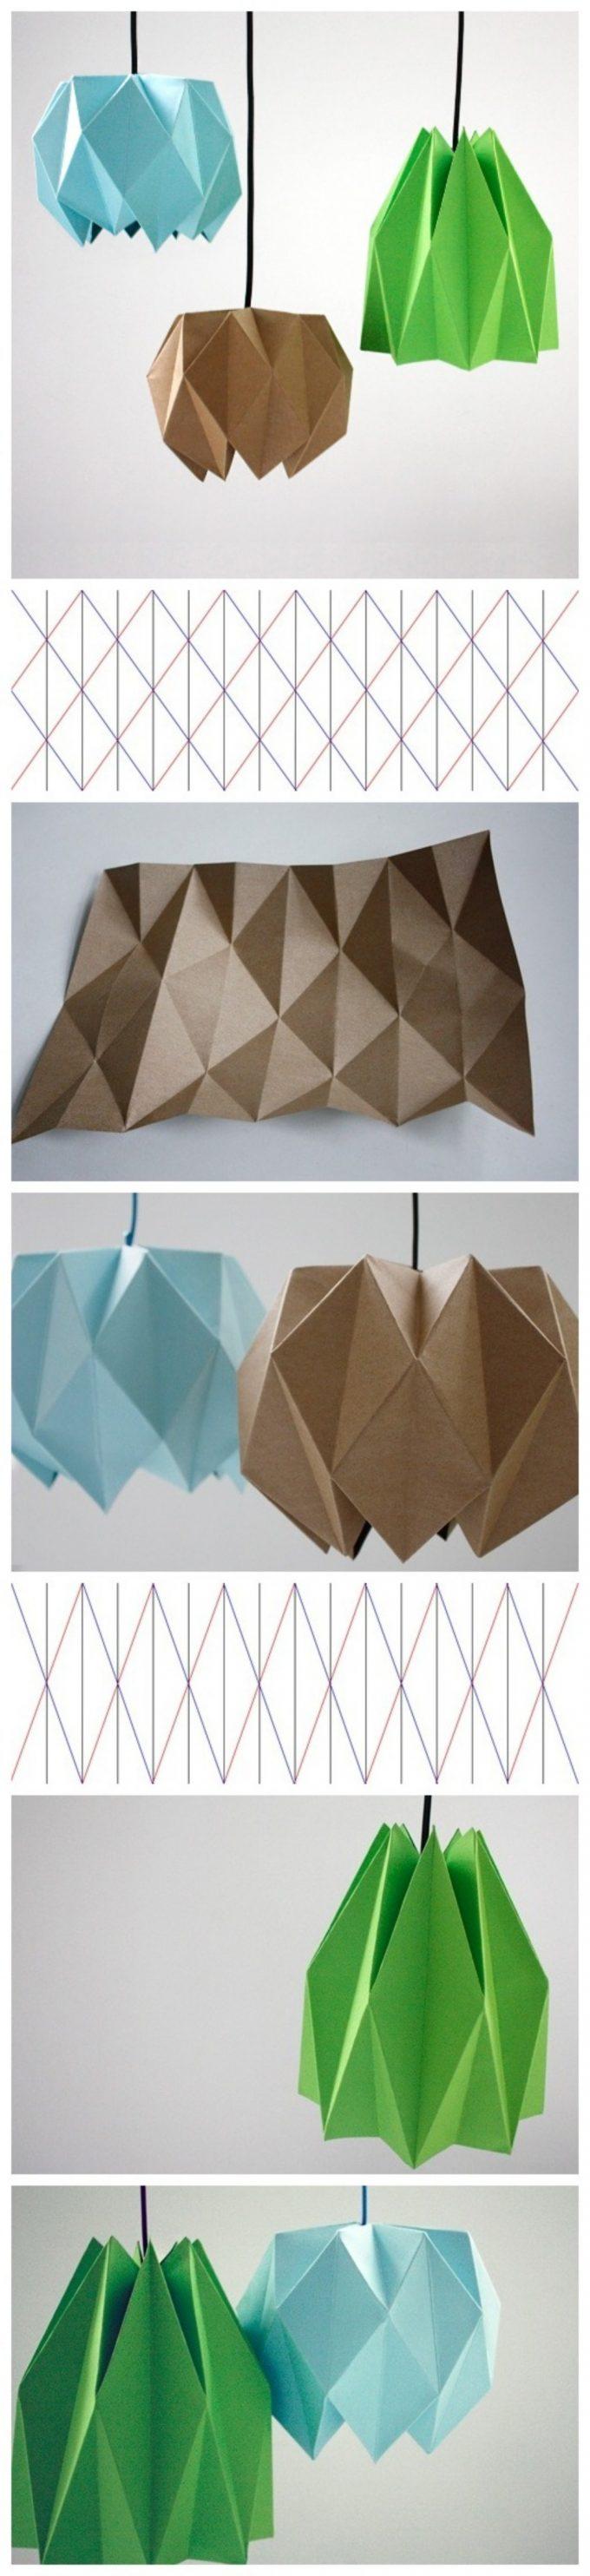 tuto lampe origami diy patron blog deco clemaroundthecorner